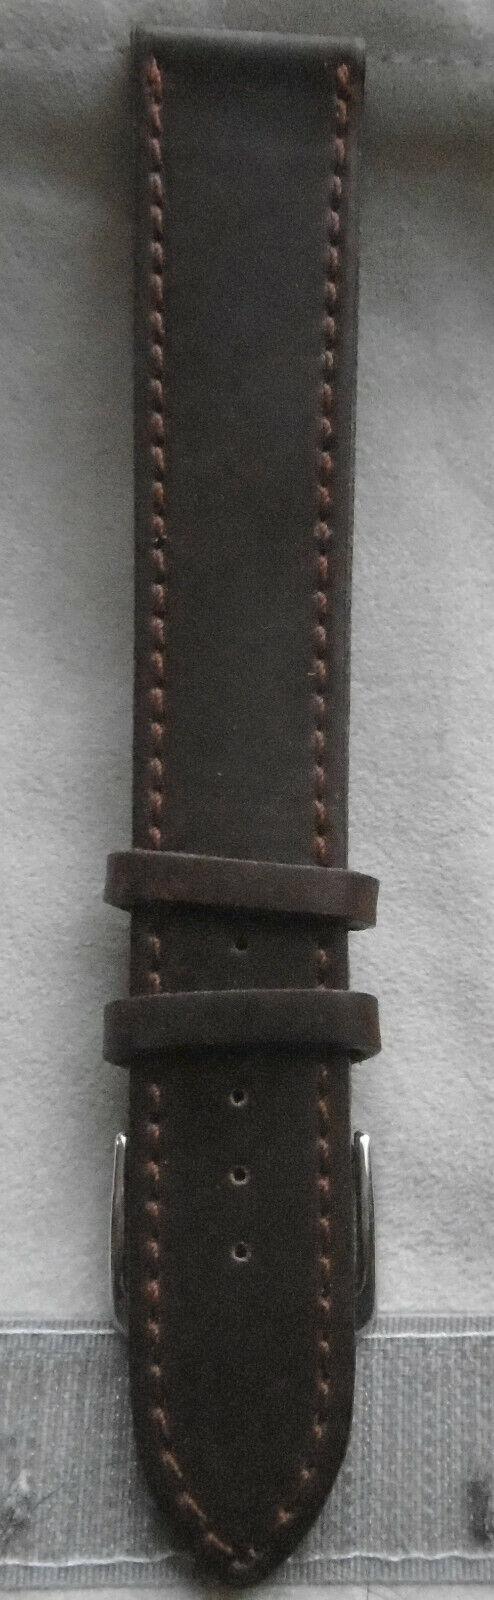 Nomos Lederband braunrot 20 mm